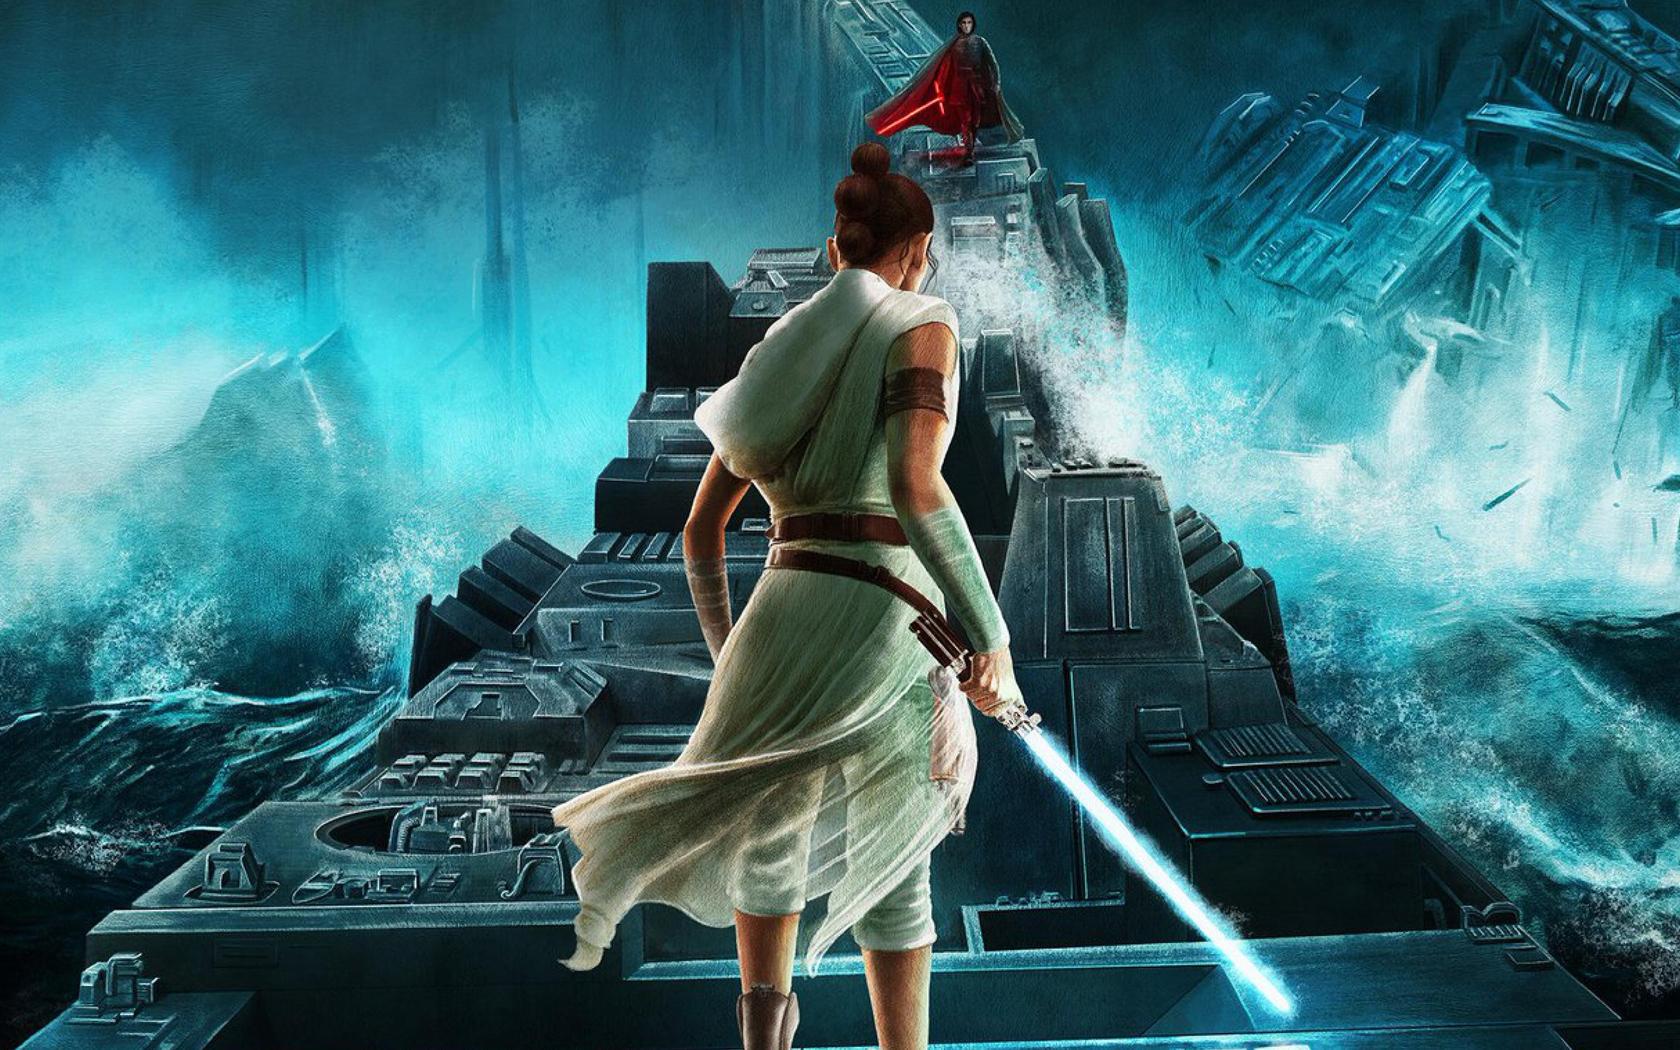 star-wars-the-rise-of-skywalker-textless-poster-ea.jpg